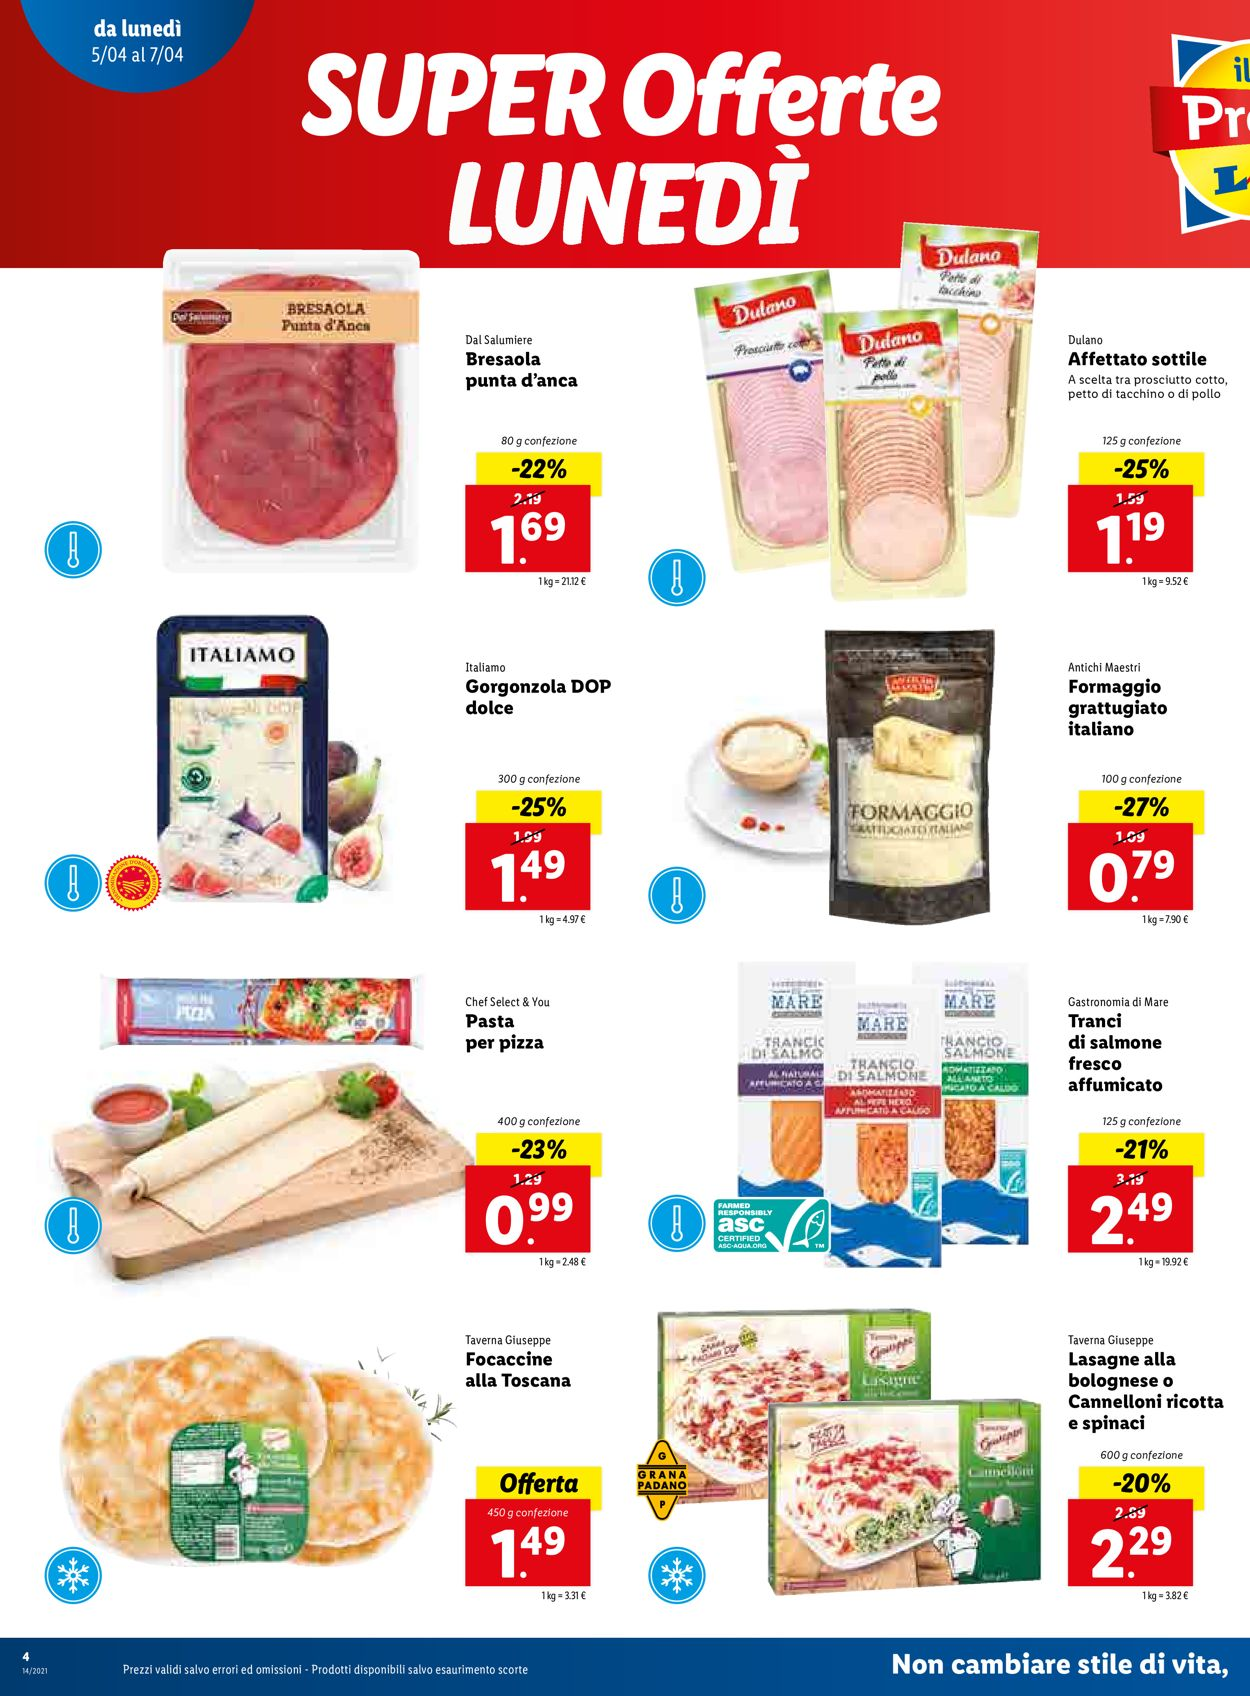 Volantino Lidl - Offerte 05/04-11/04/2021 (Pagina 4)